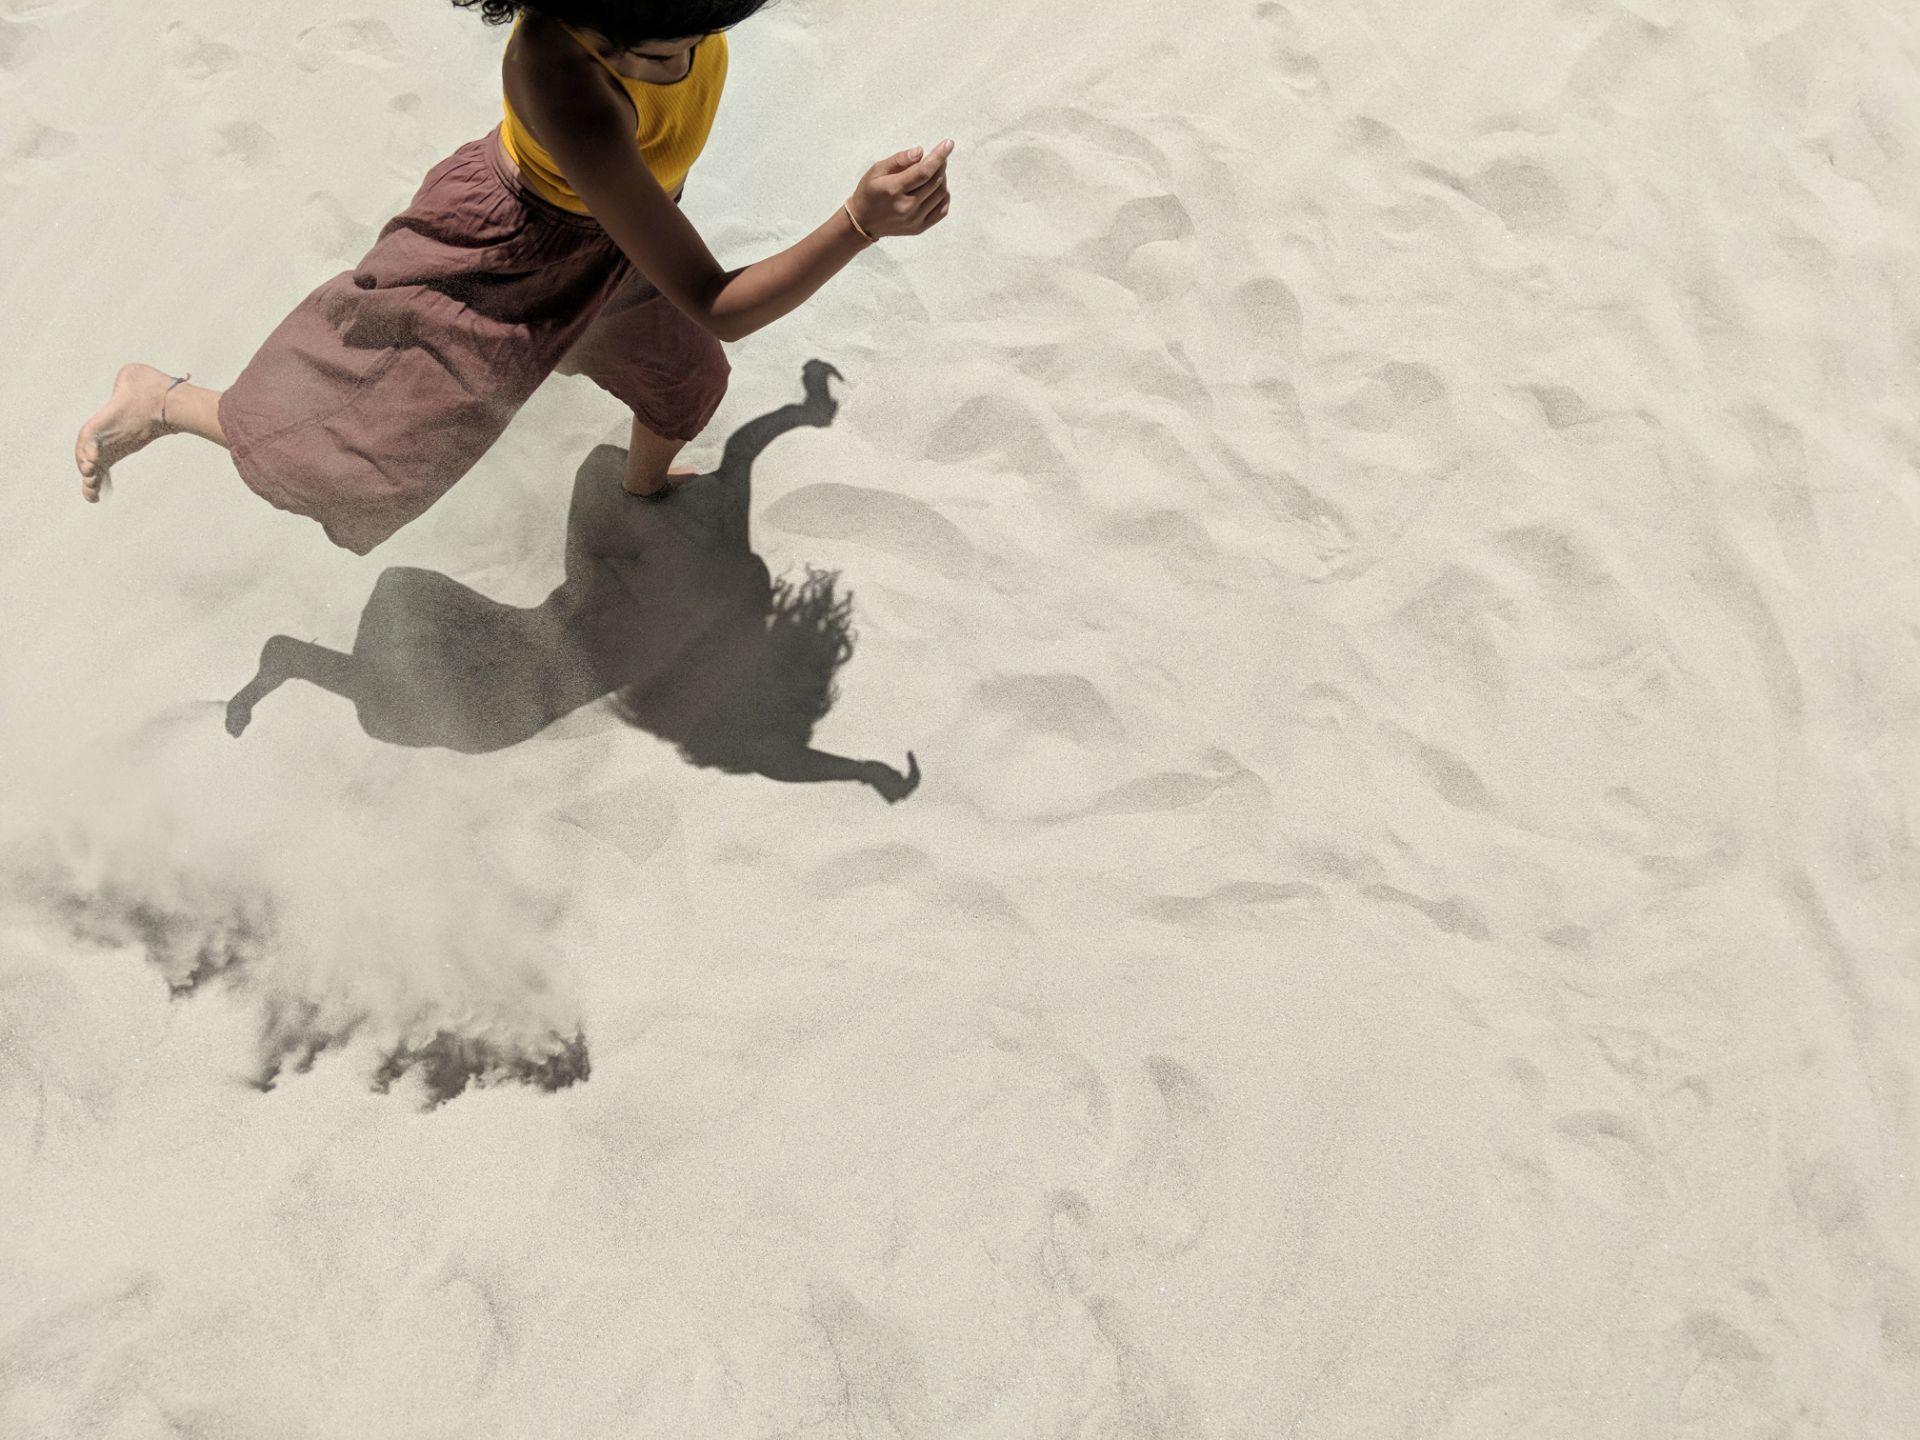 Swishing sand wearing yellow brown Ladakh dancing dance pose